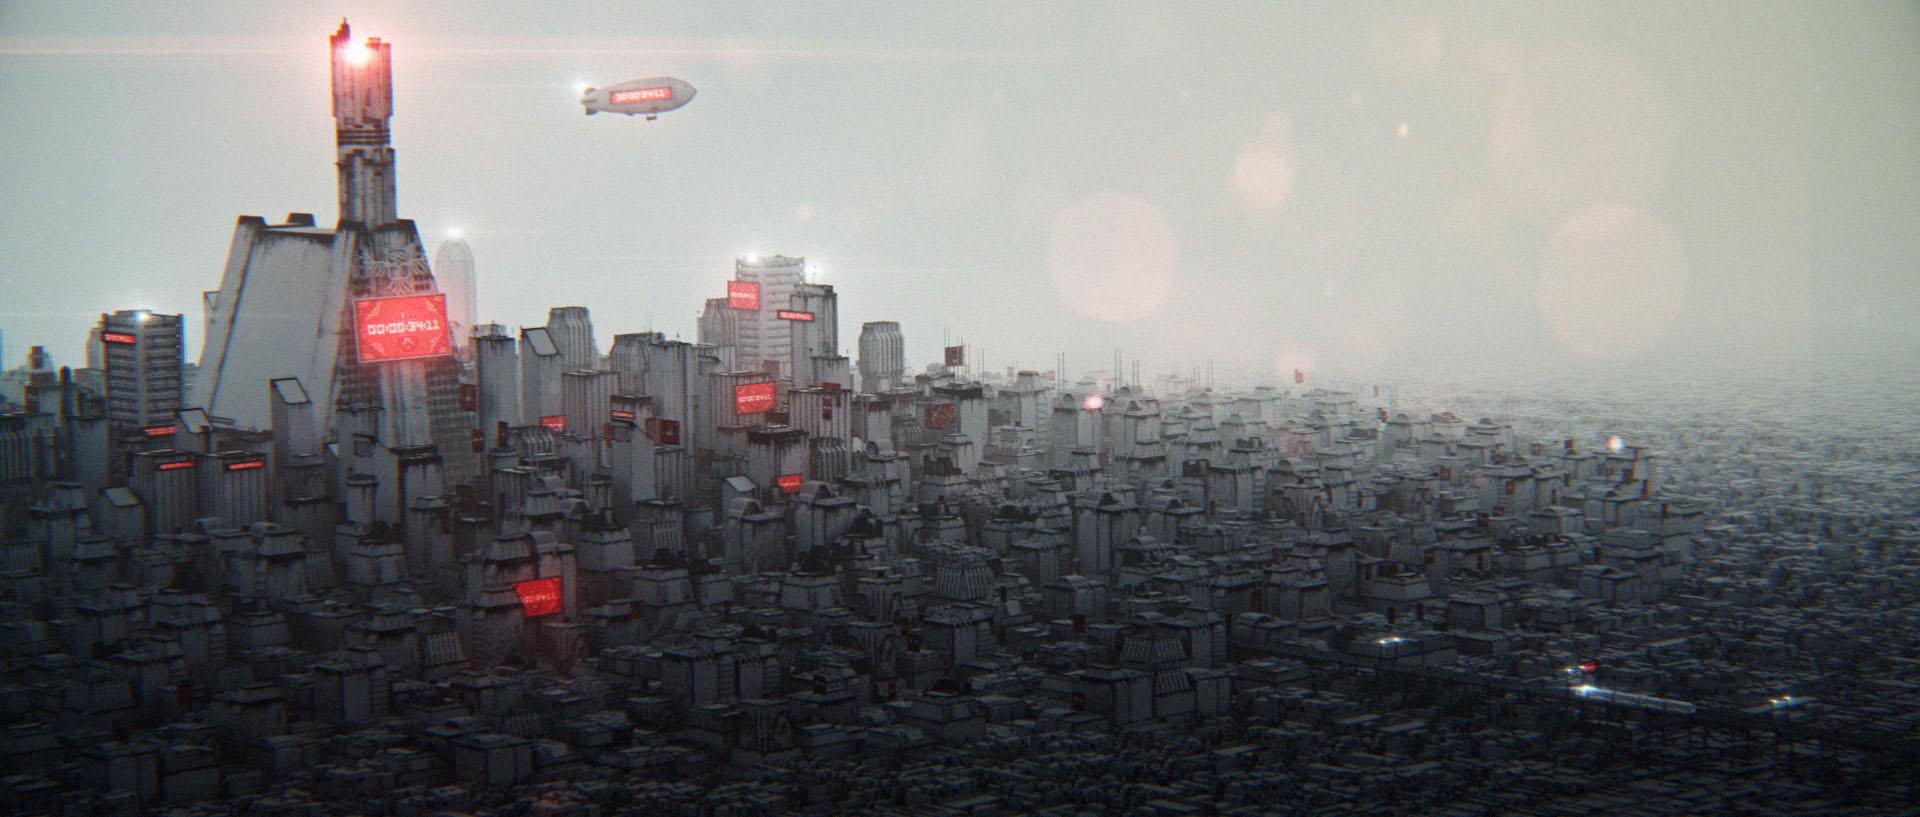 Sci-Fi-London_0000_01.jpg